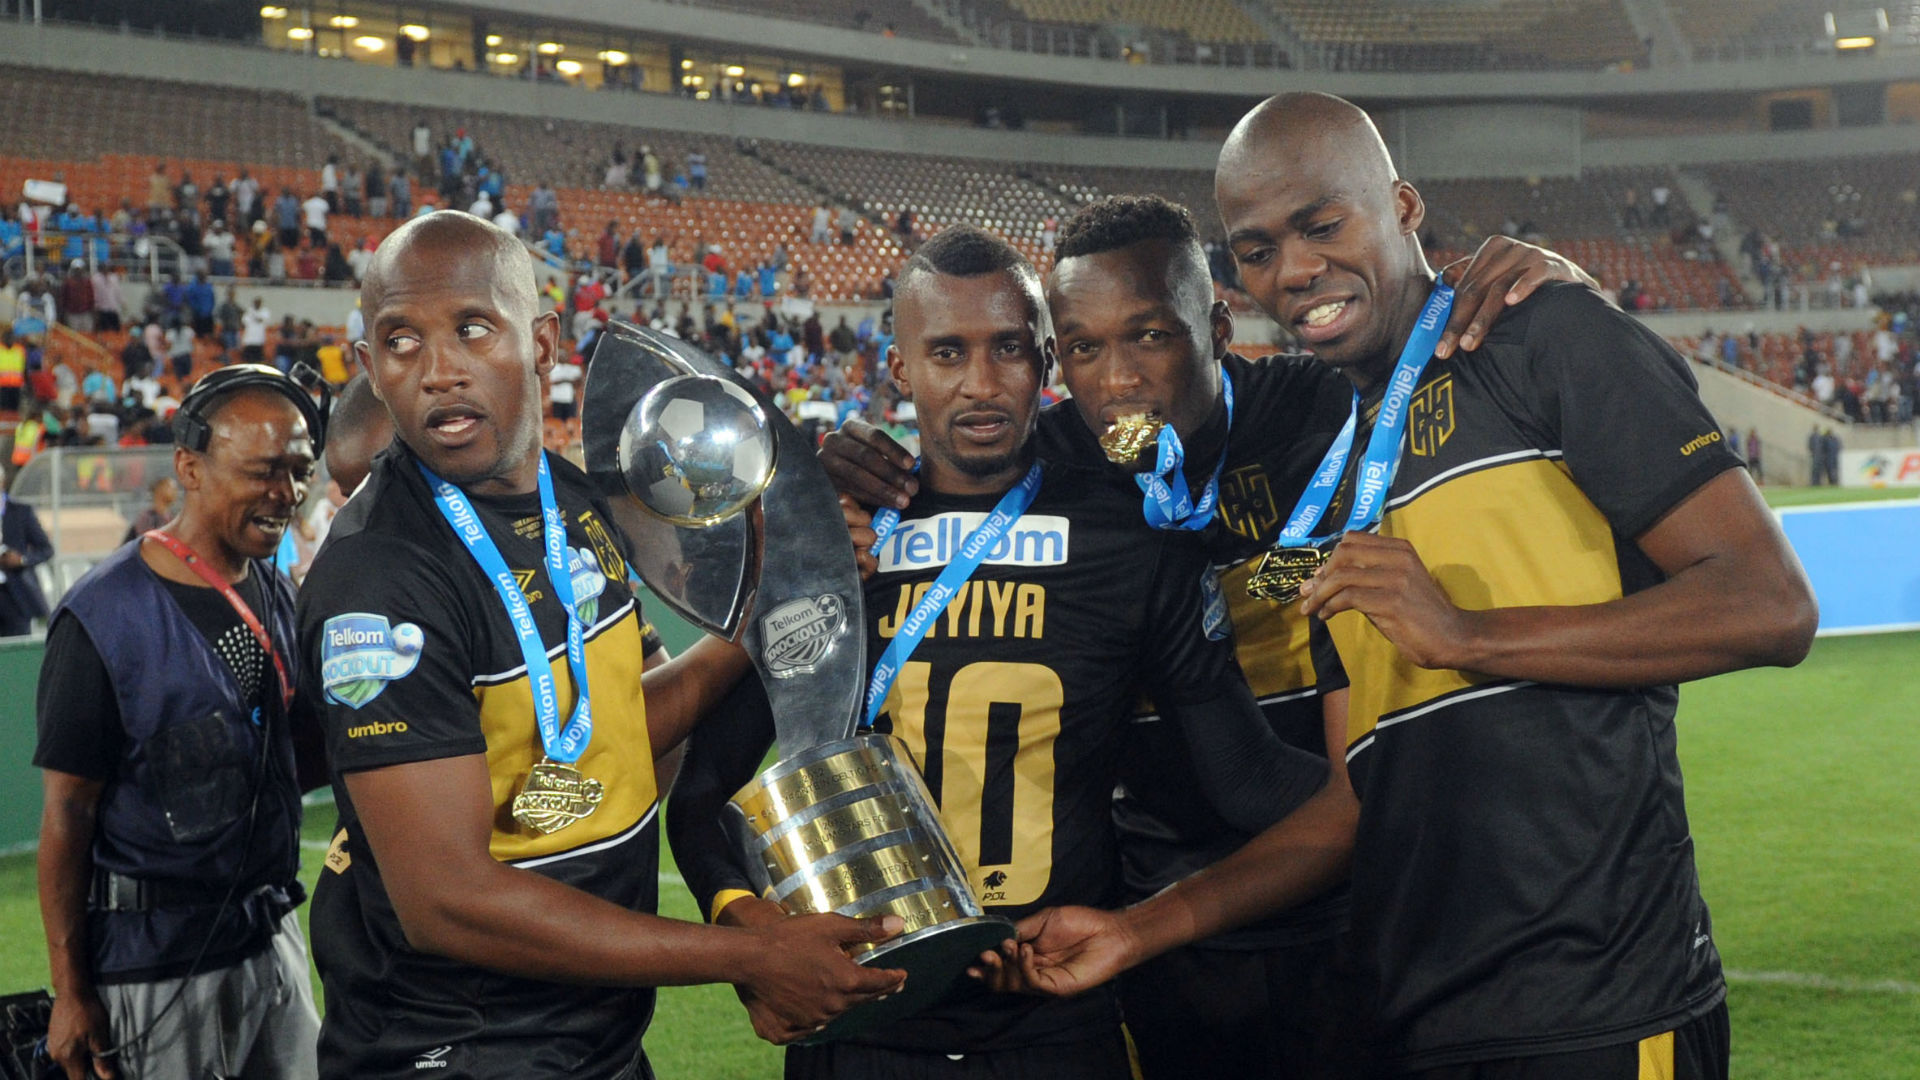 Vincent Kobola, Bhongolethu Jayiya, Sibusiso Masina & Mpho Matsi